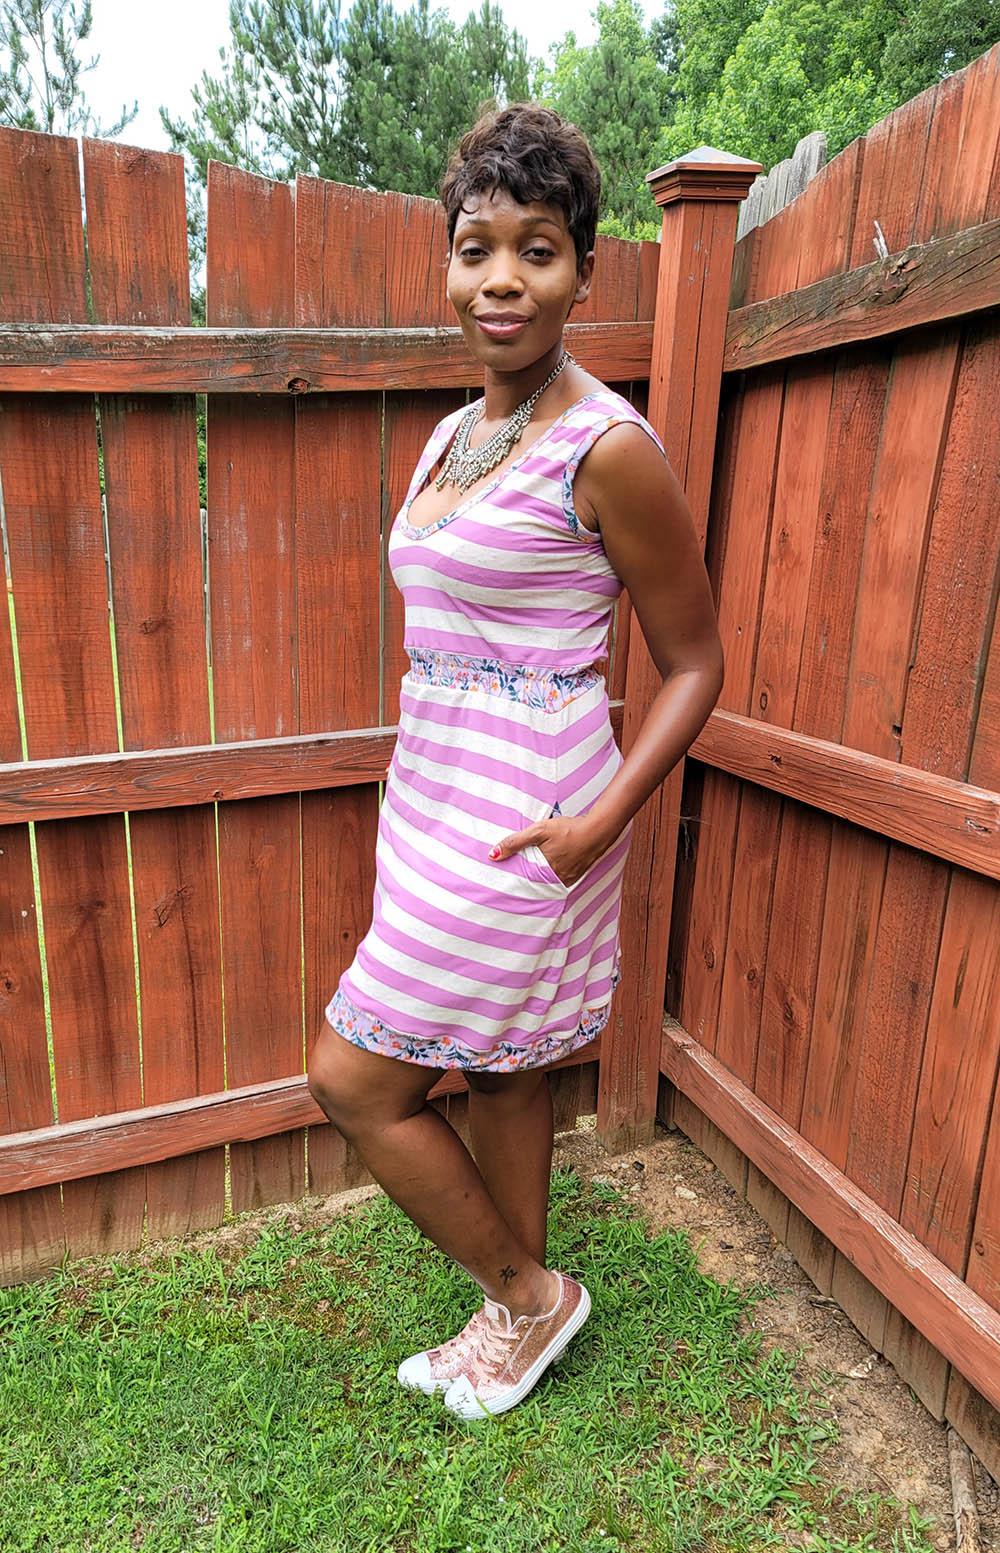 Blondie's Knit Roller Rink Dress  Sizes XXS to 3X Adults PDF Pattern